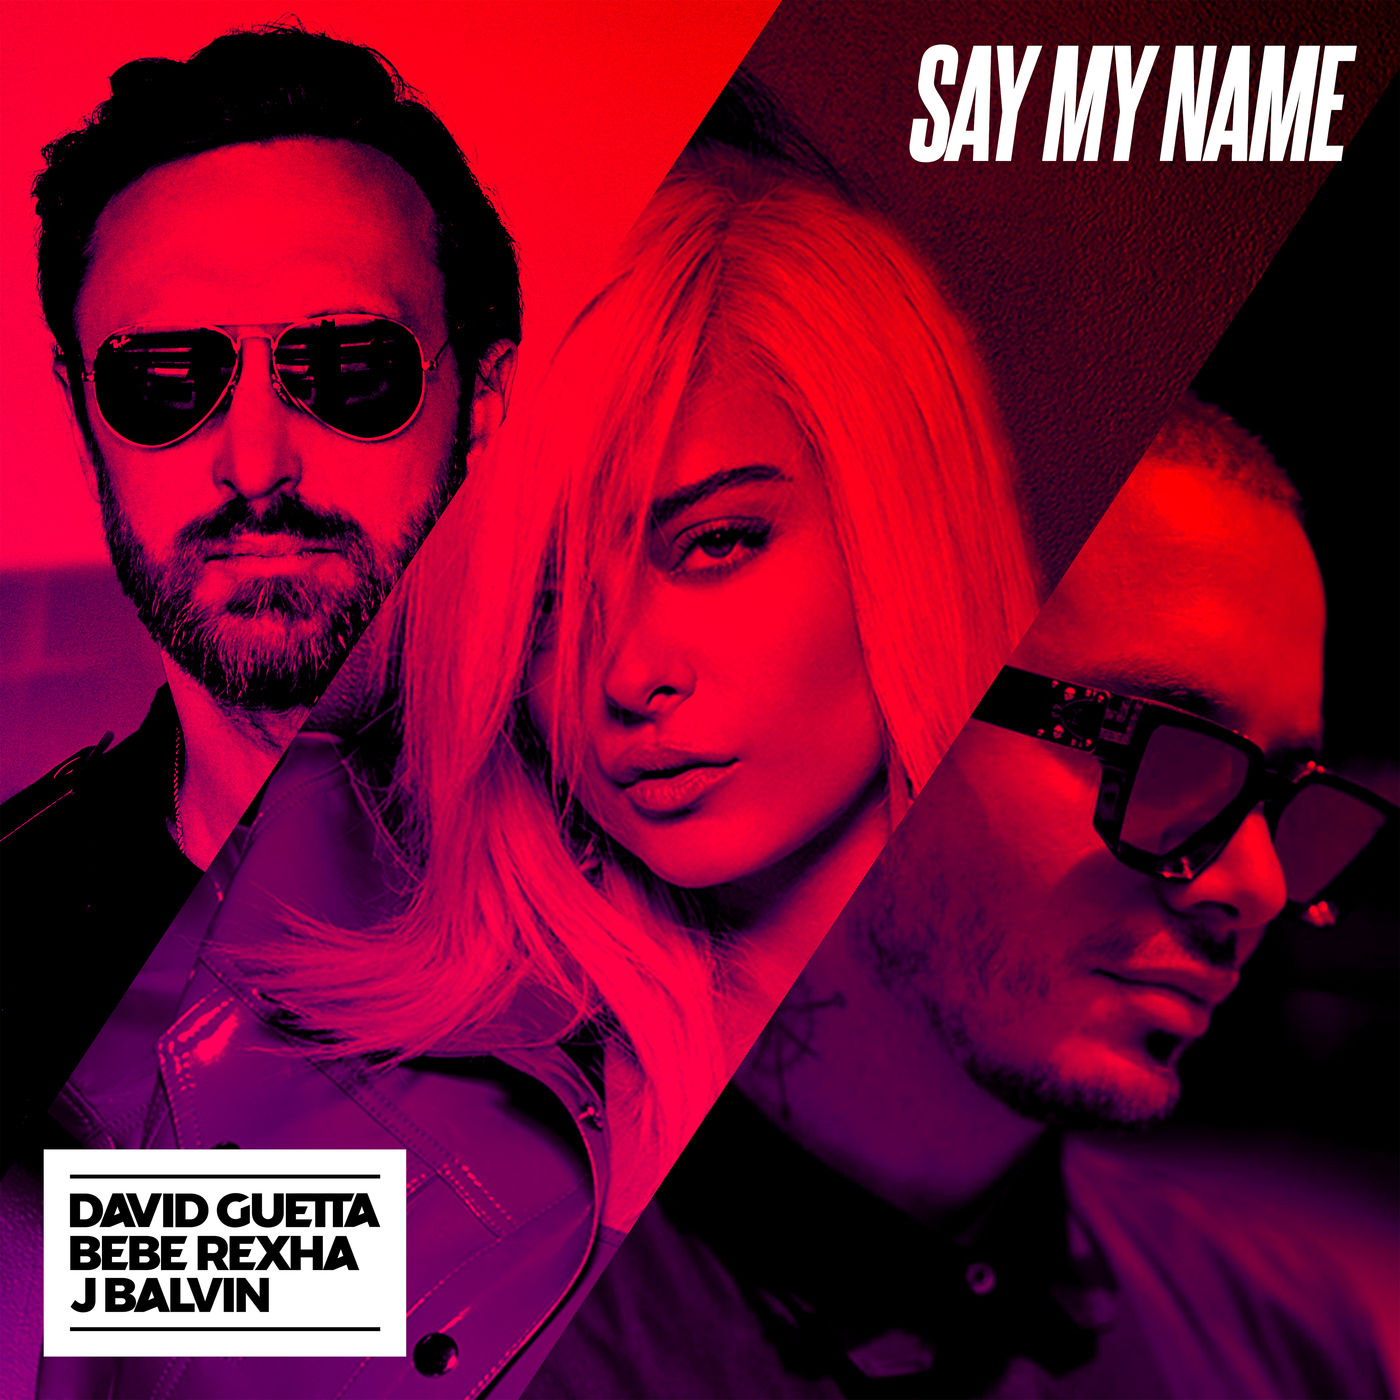 David Guetta, Bebe Rexha & J Balvin: Say My Name (2018) - IMDb